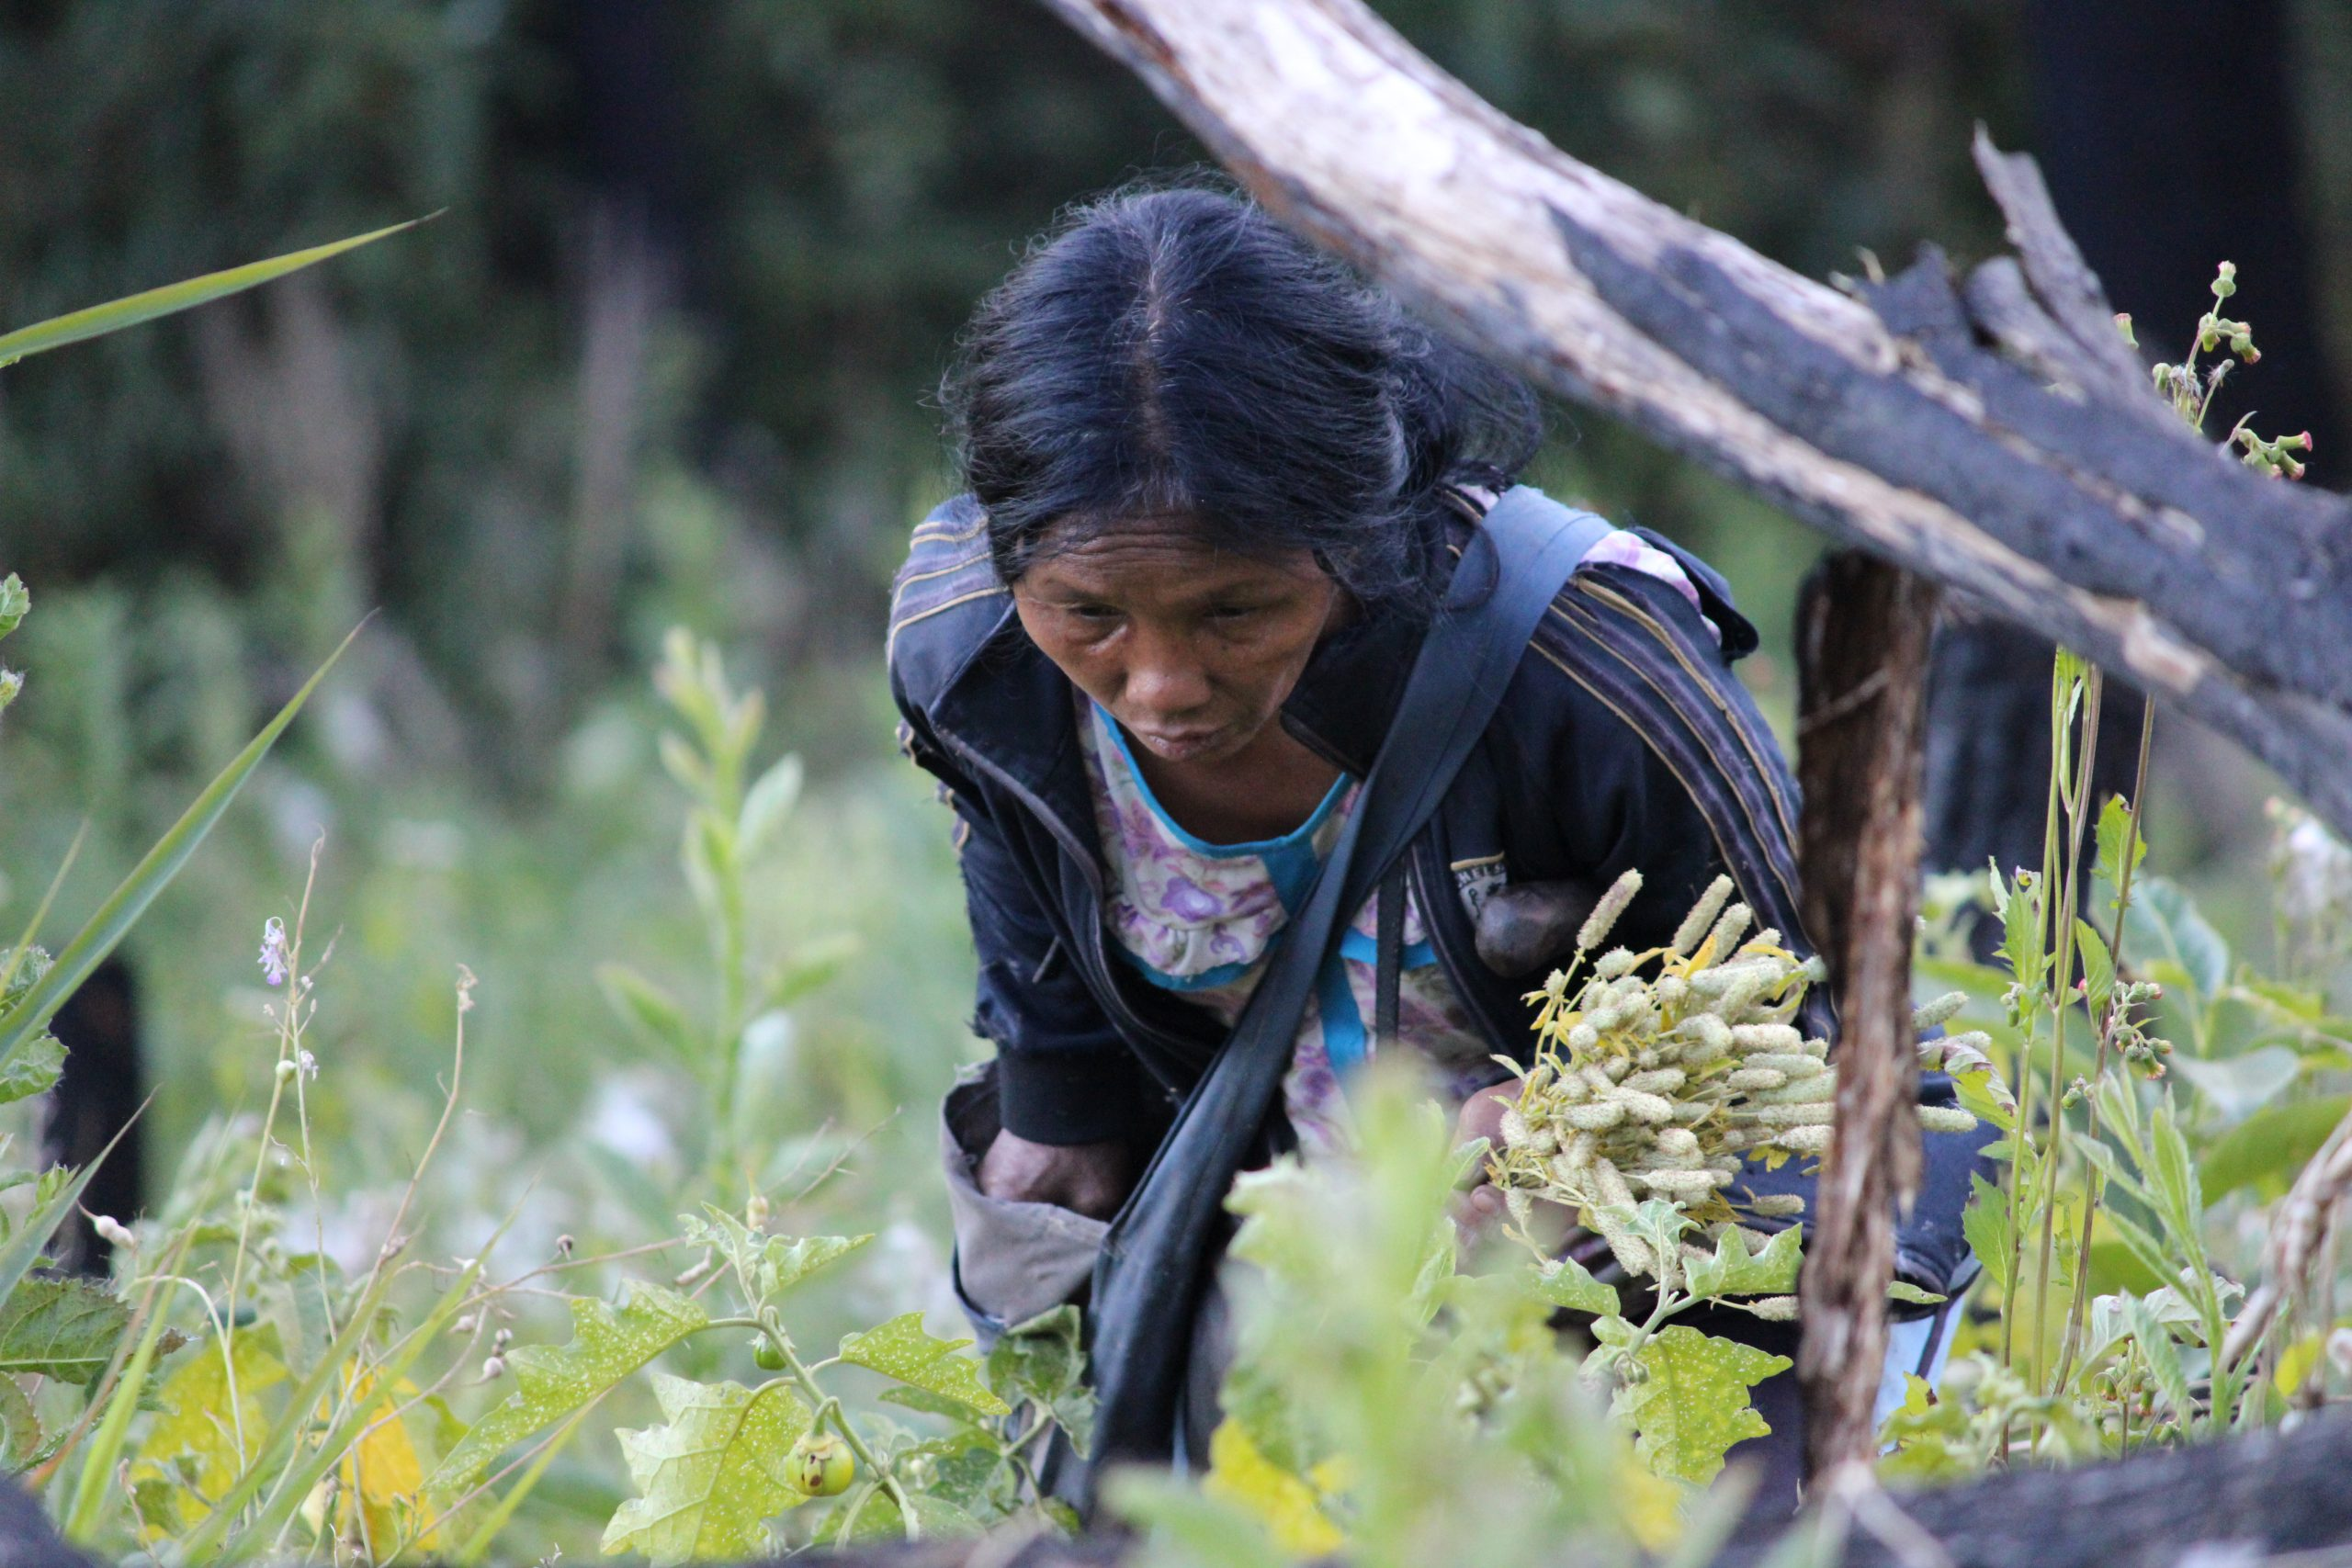 Lady picking flowers in farm